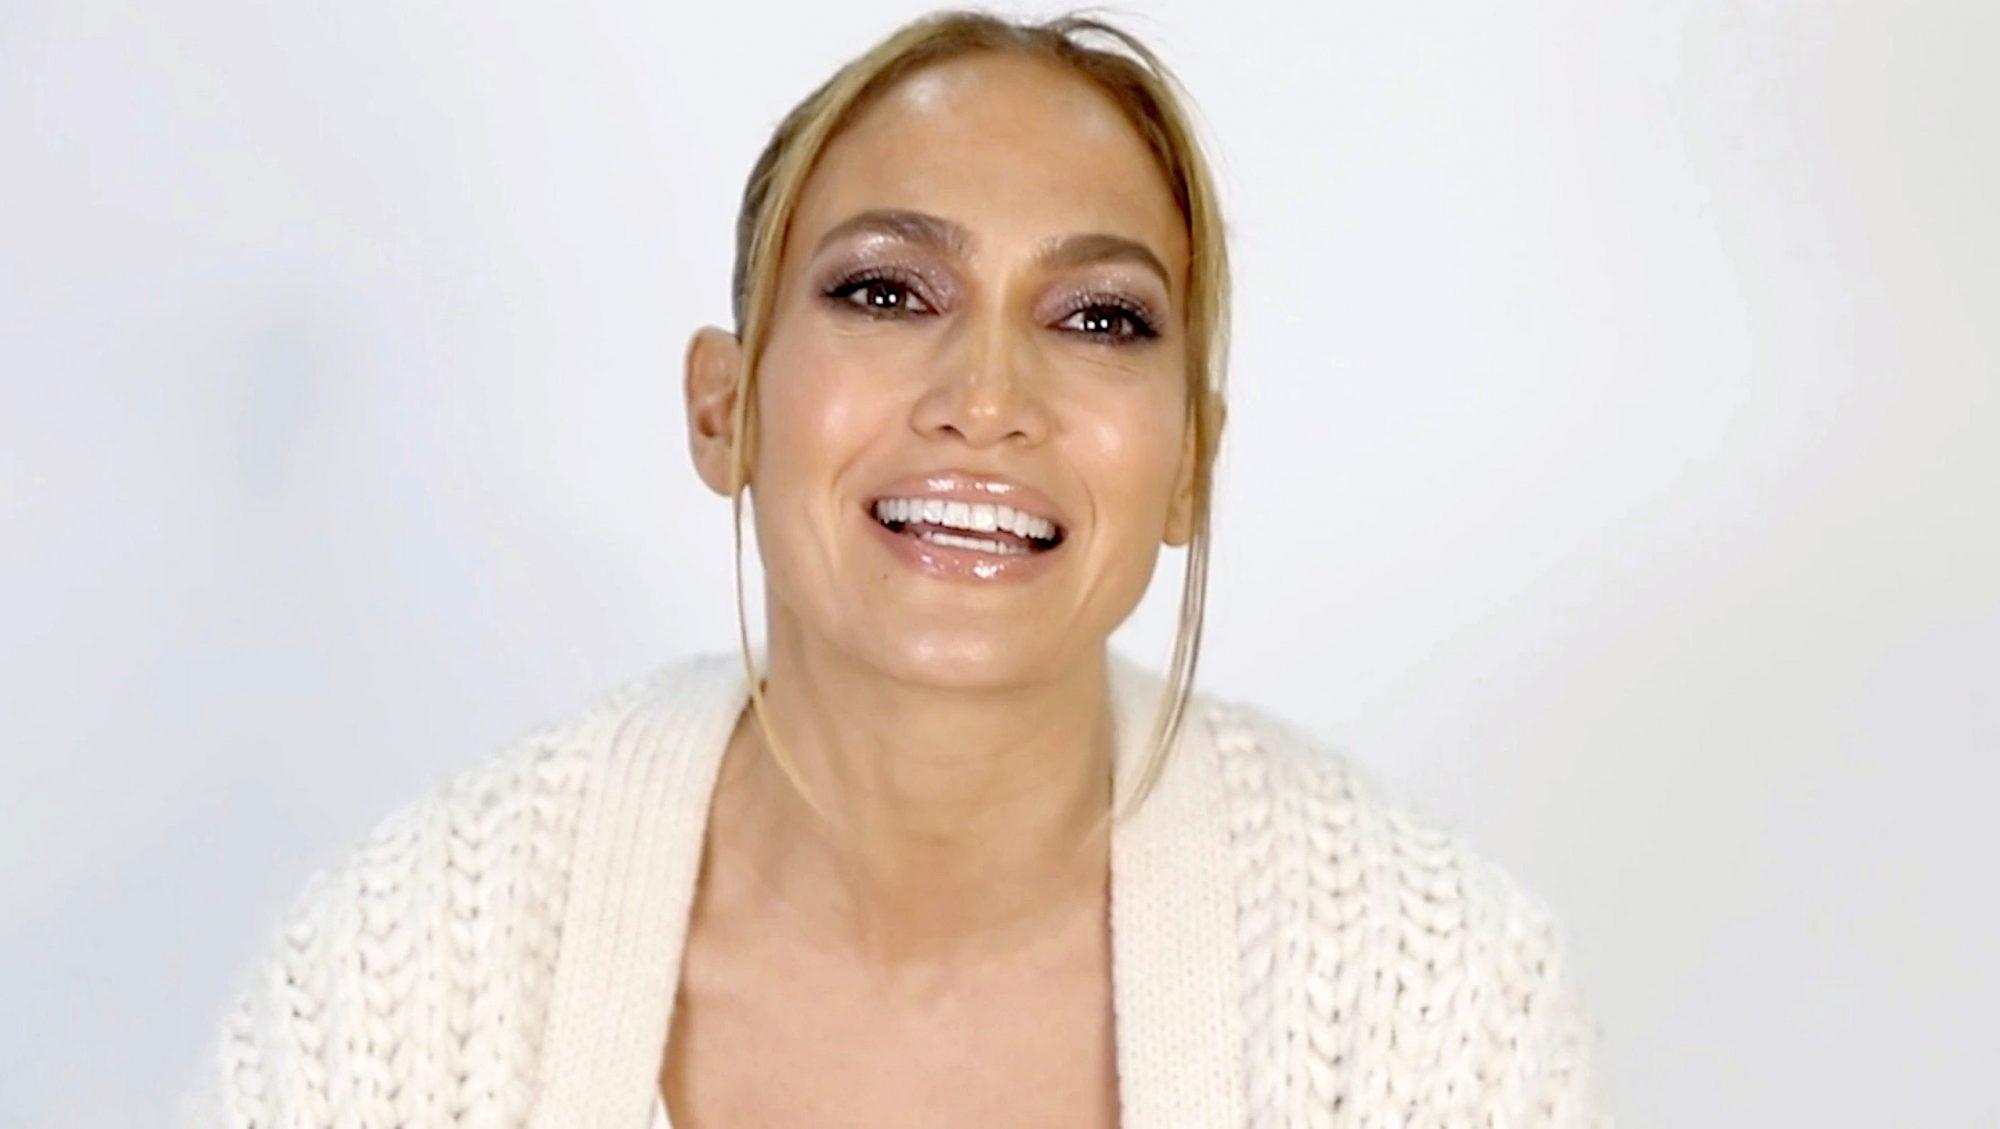 Jennifer Lopez Shares Her Nighttime Beauty Routine